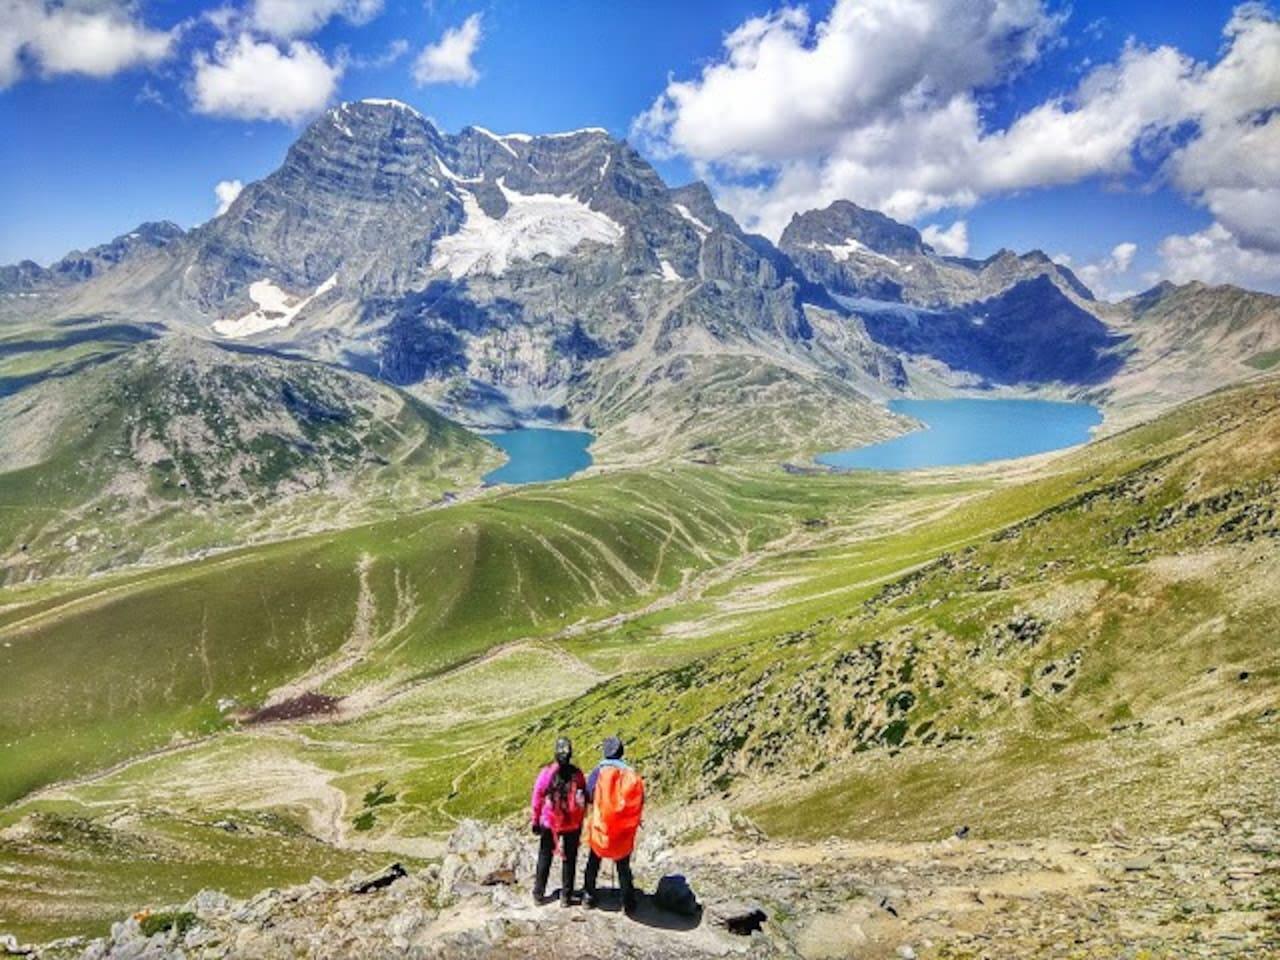 Great lakes of kashmir, I Do arrange trekking also, Guide myself